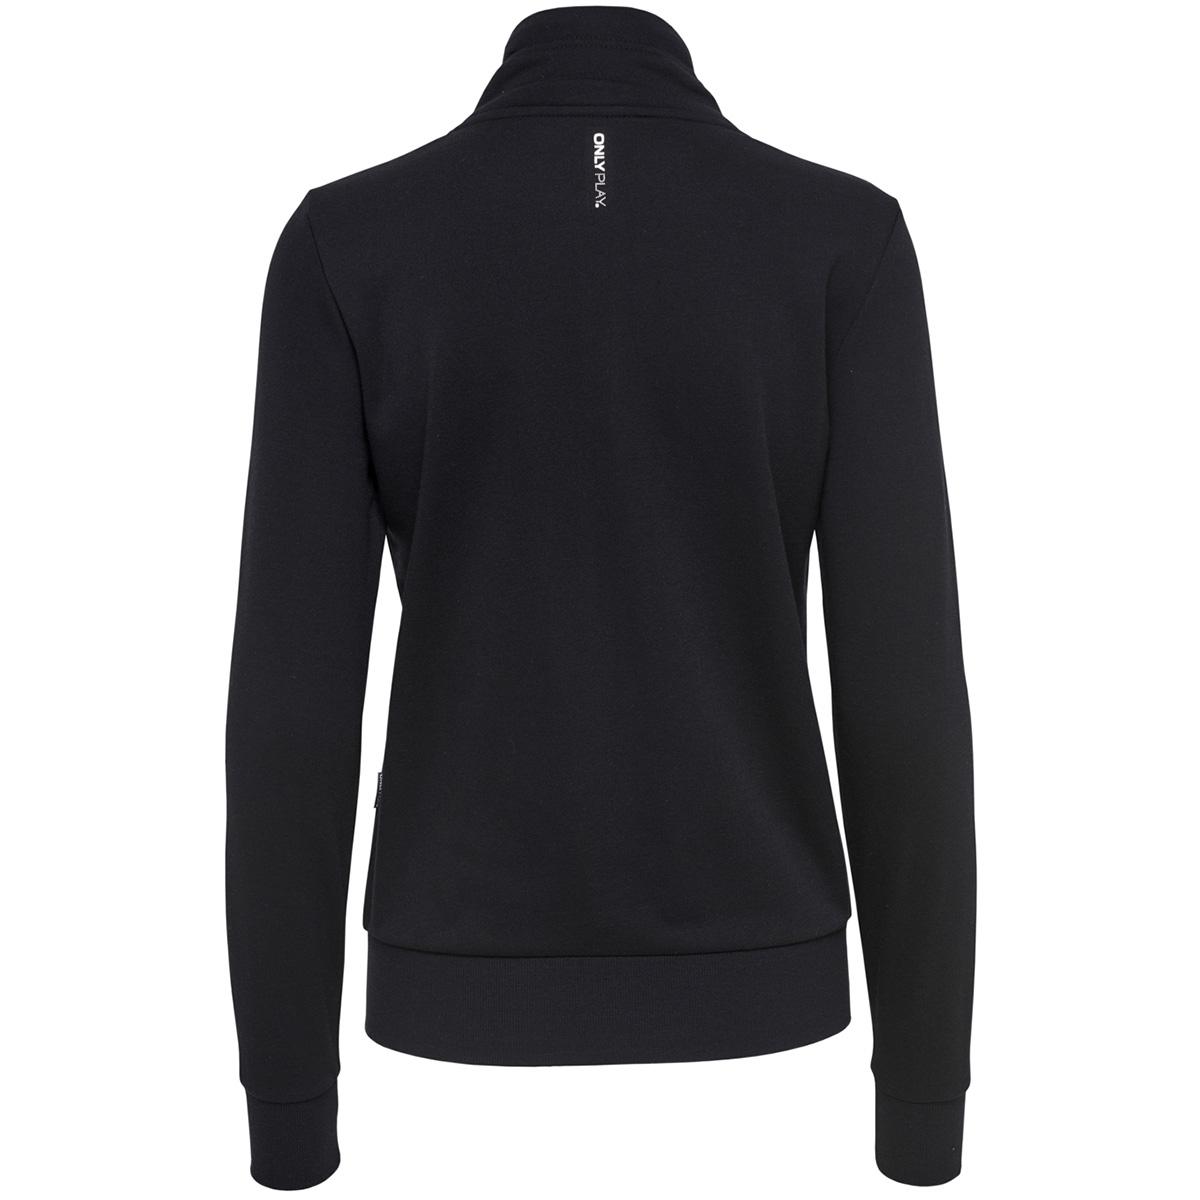 onpelina high neck sweat - opus 15167775 only play sport vest black